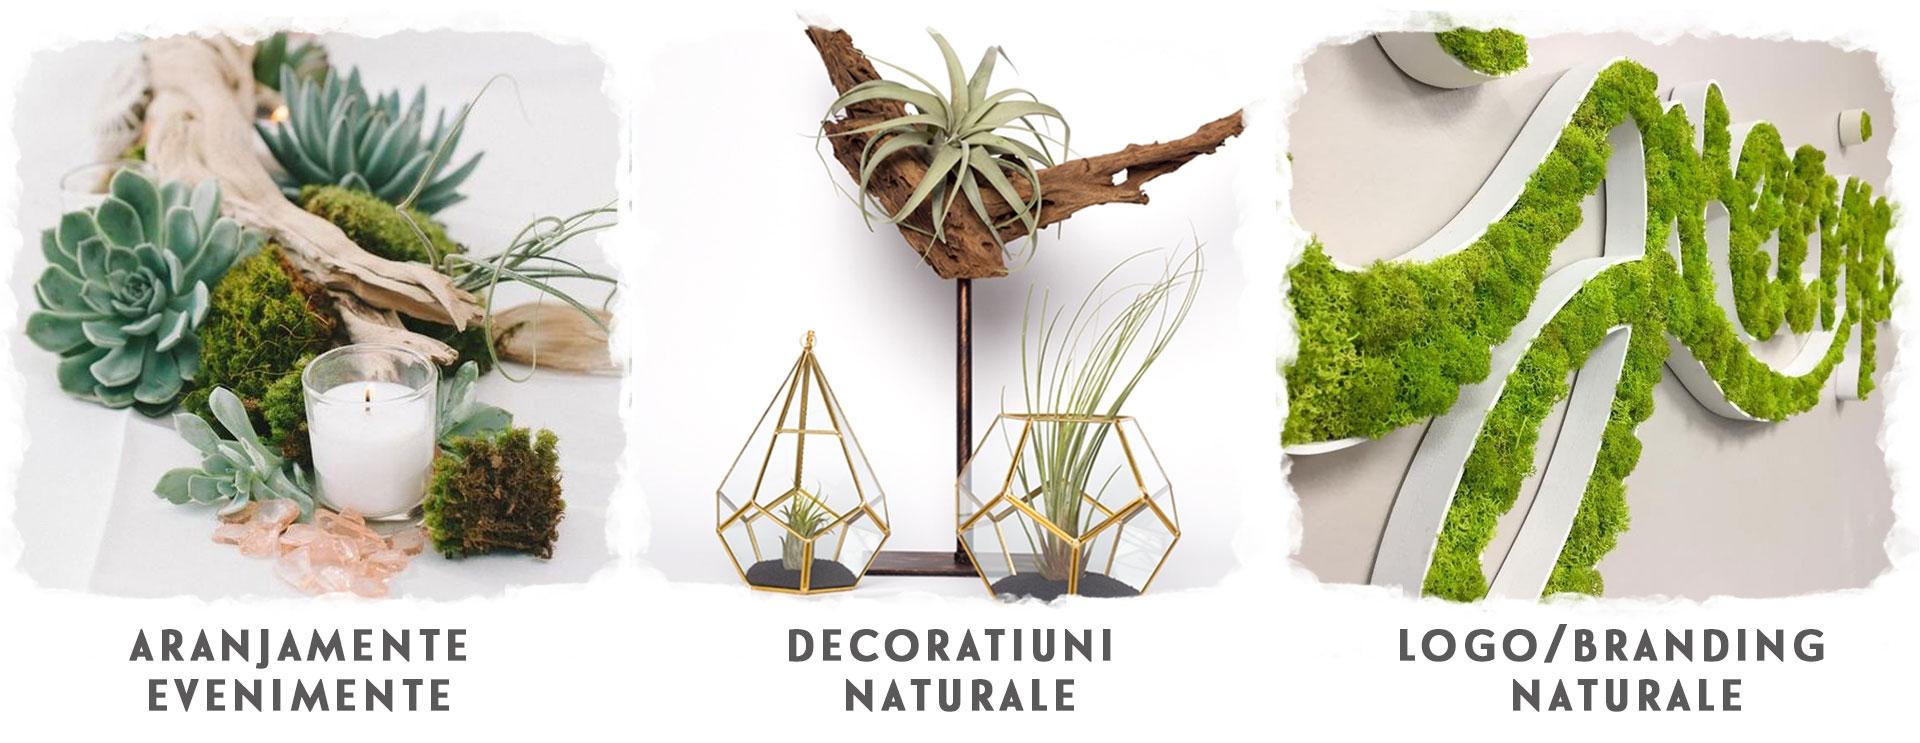 Logo verde vegetal evenimente aranjamente plante suculente